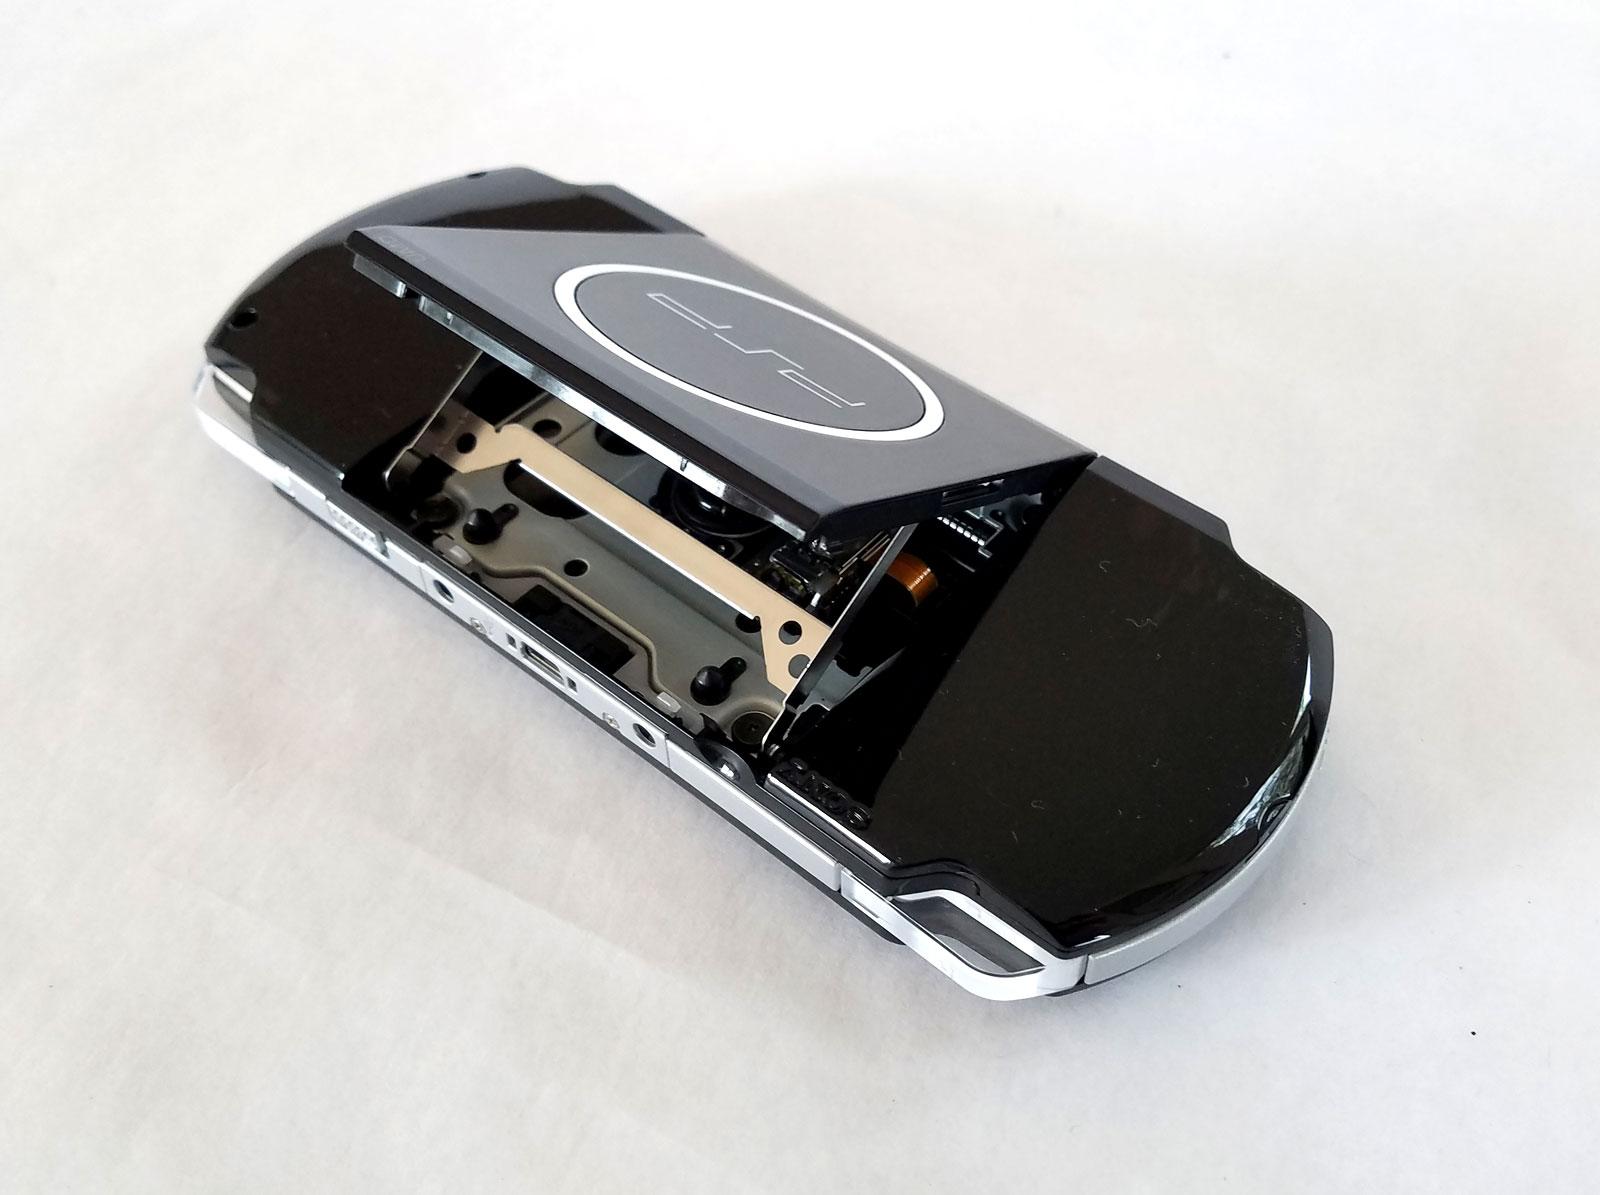 SONY PSP 3004 (portable) price in Pakistan, Sony in